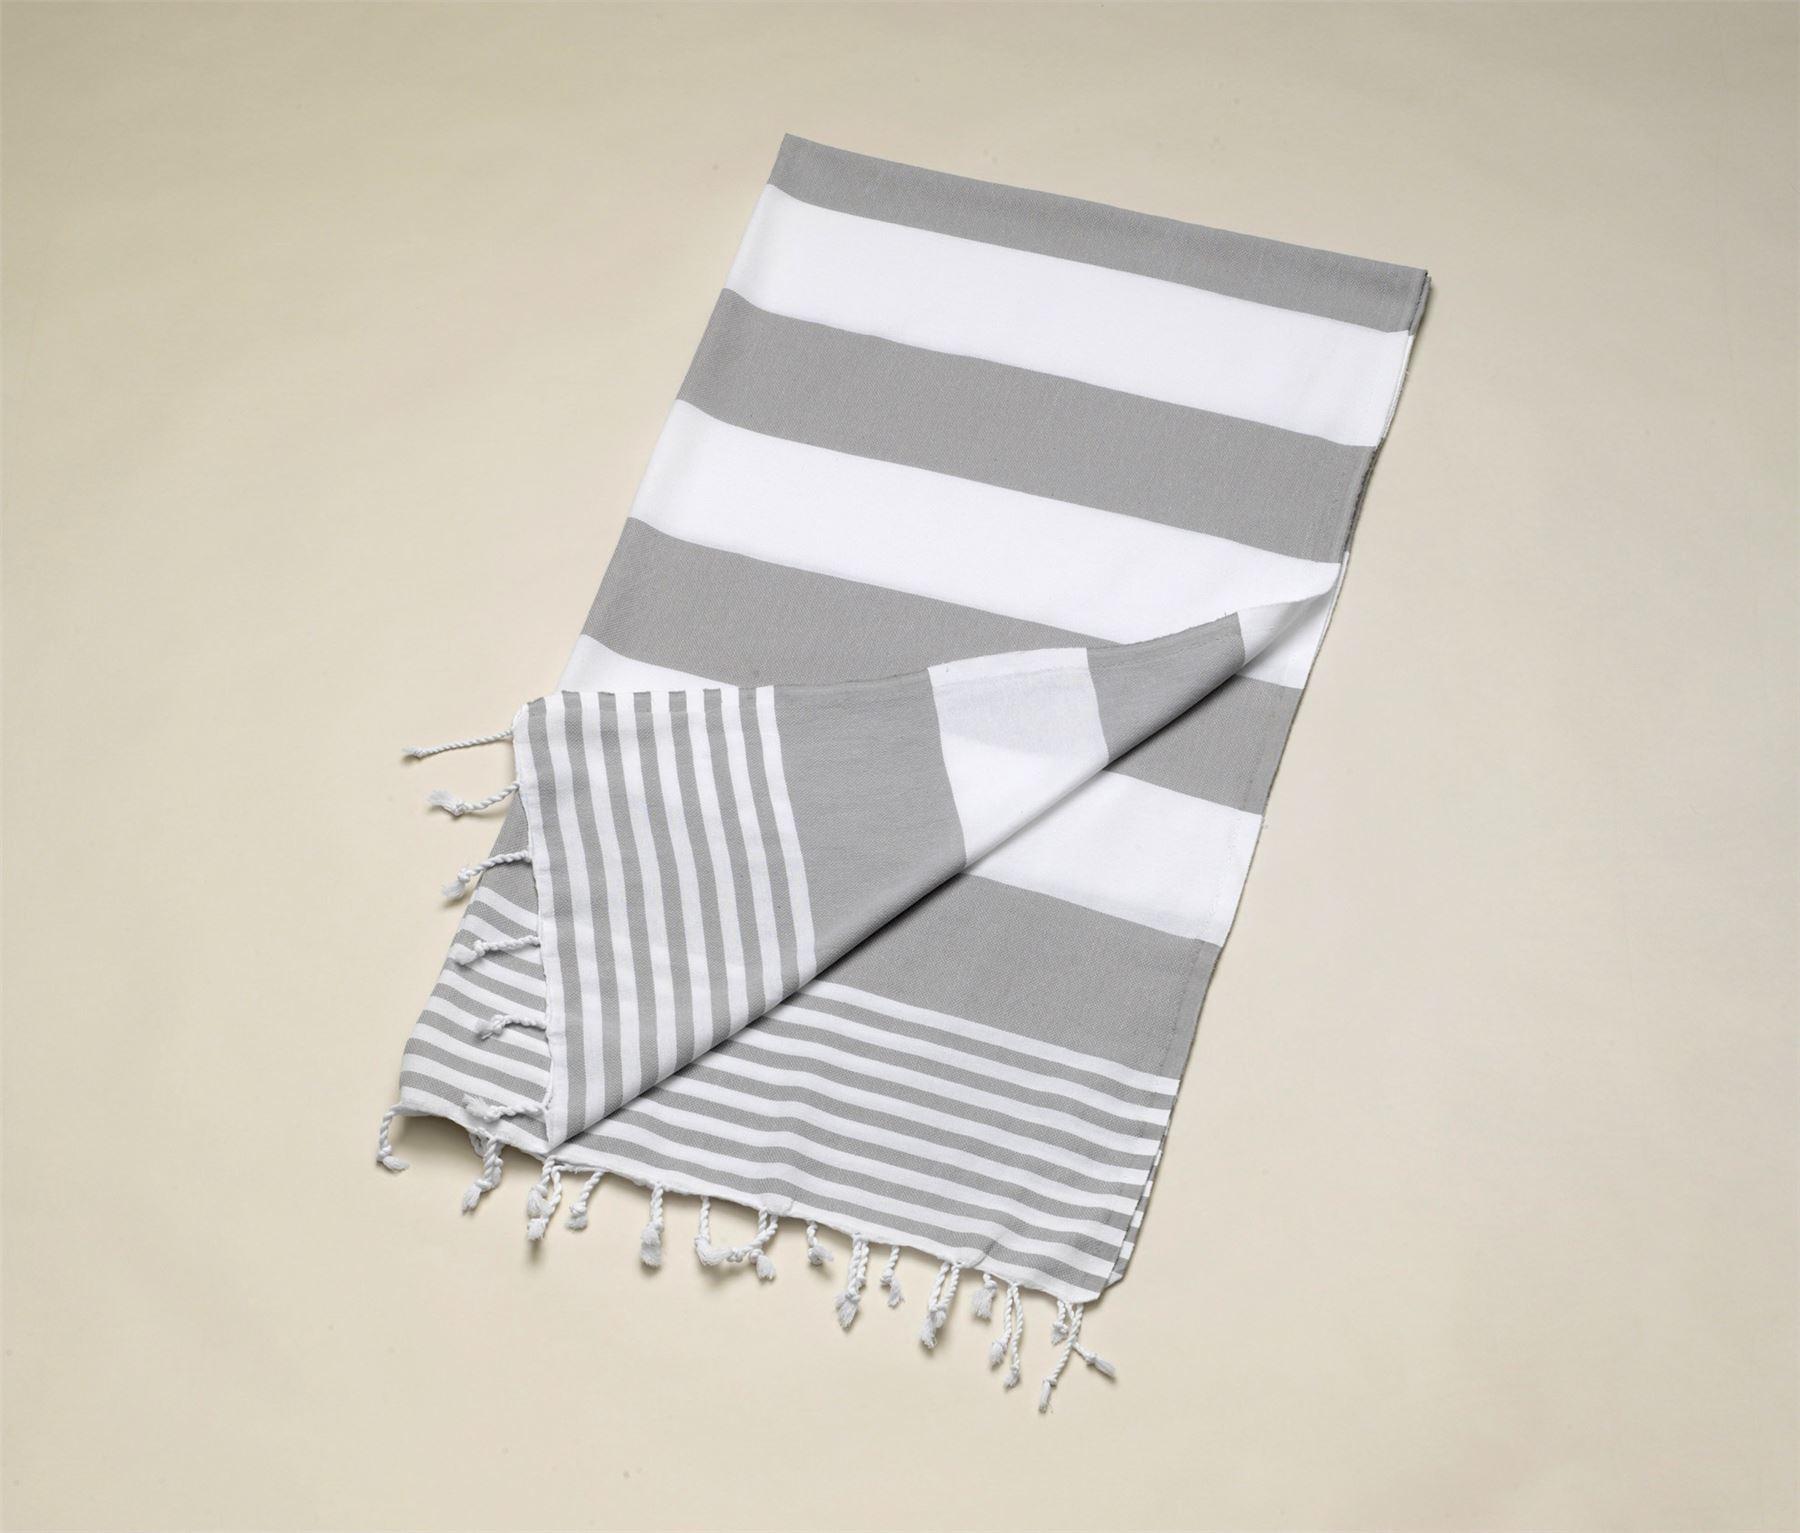 lelilian hammam grand turque drap serviette de plage bain coton gb ebay. Black Bedroom Furniture Sets. Home Design Ideas